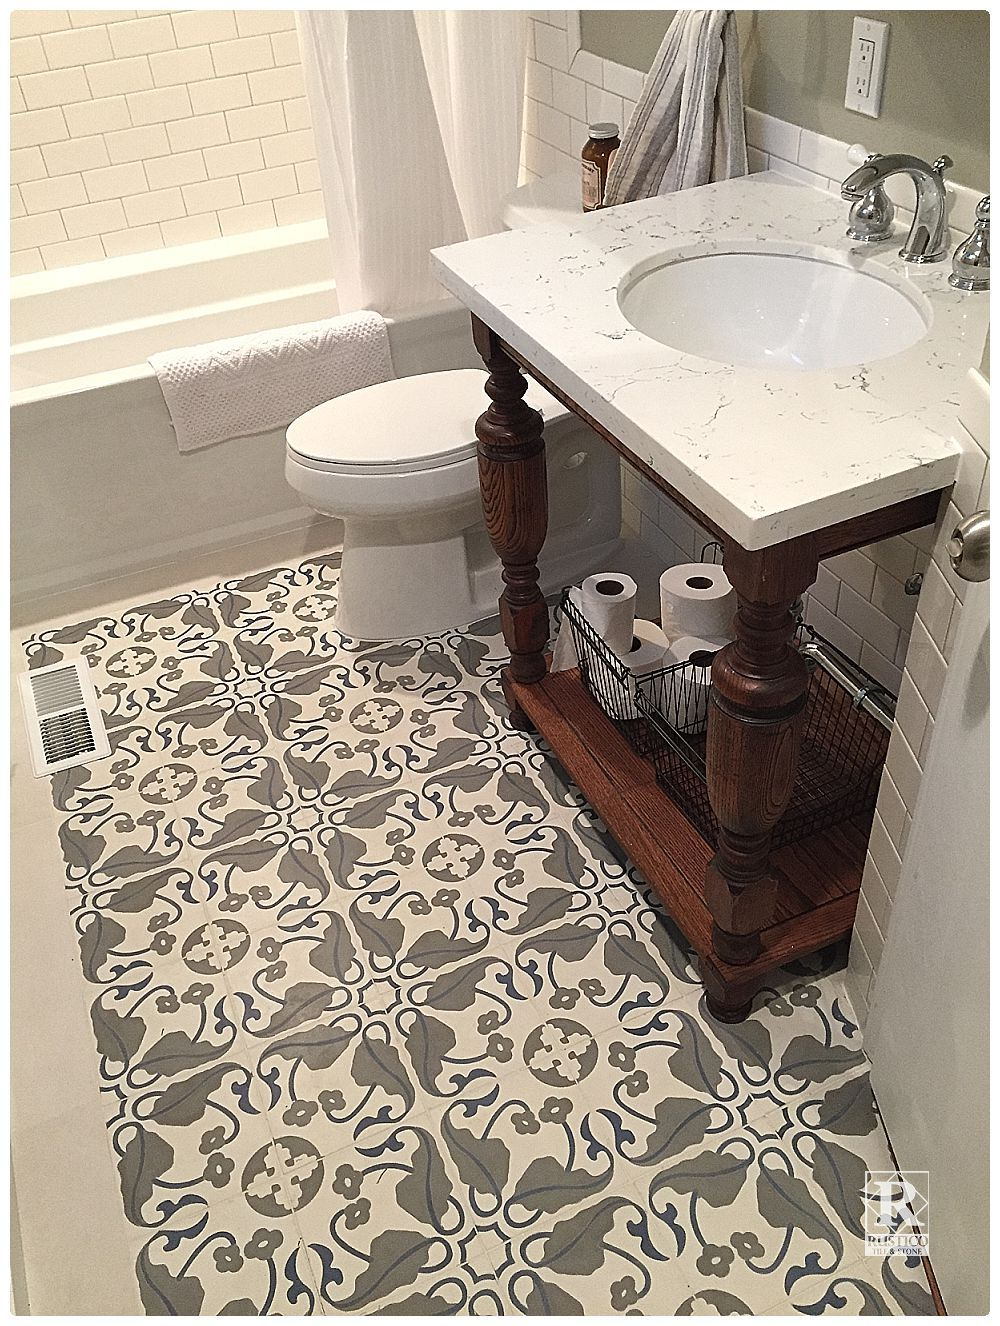 Cement tile floors encaustic tiles rustico tile and stone cement tile floors encaustic tiles rustico tile and stone cement tiles bathroomconcrete dailygadgetfo Choice Image